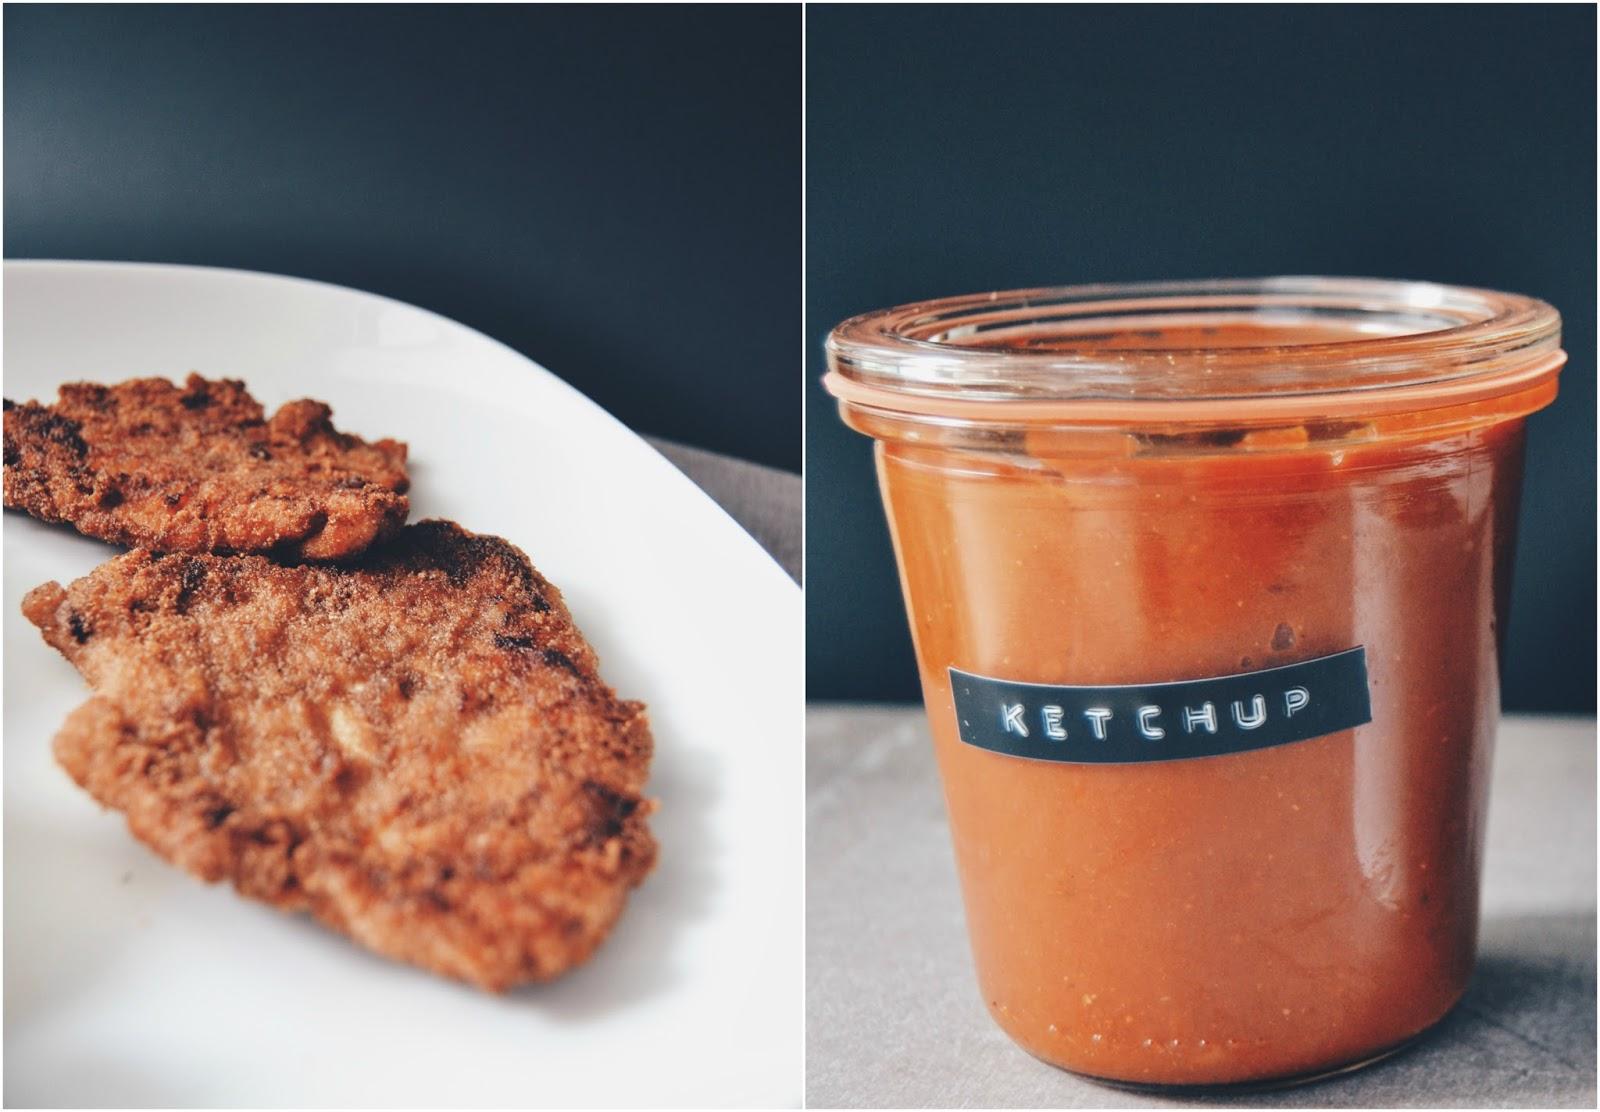 Clean-and-Healthy-Ketchup-Tomatenketchup-MetabolicBalance-Metabolic-Ketchup-CleanEating-Clean-Eating-Schnitzel-mit-Roggenpanade-Zuckerfreies-Ketchup